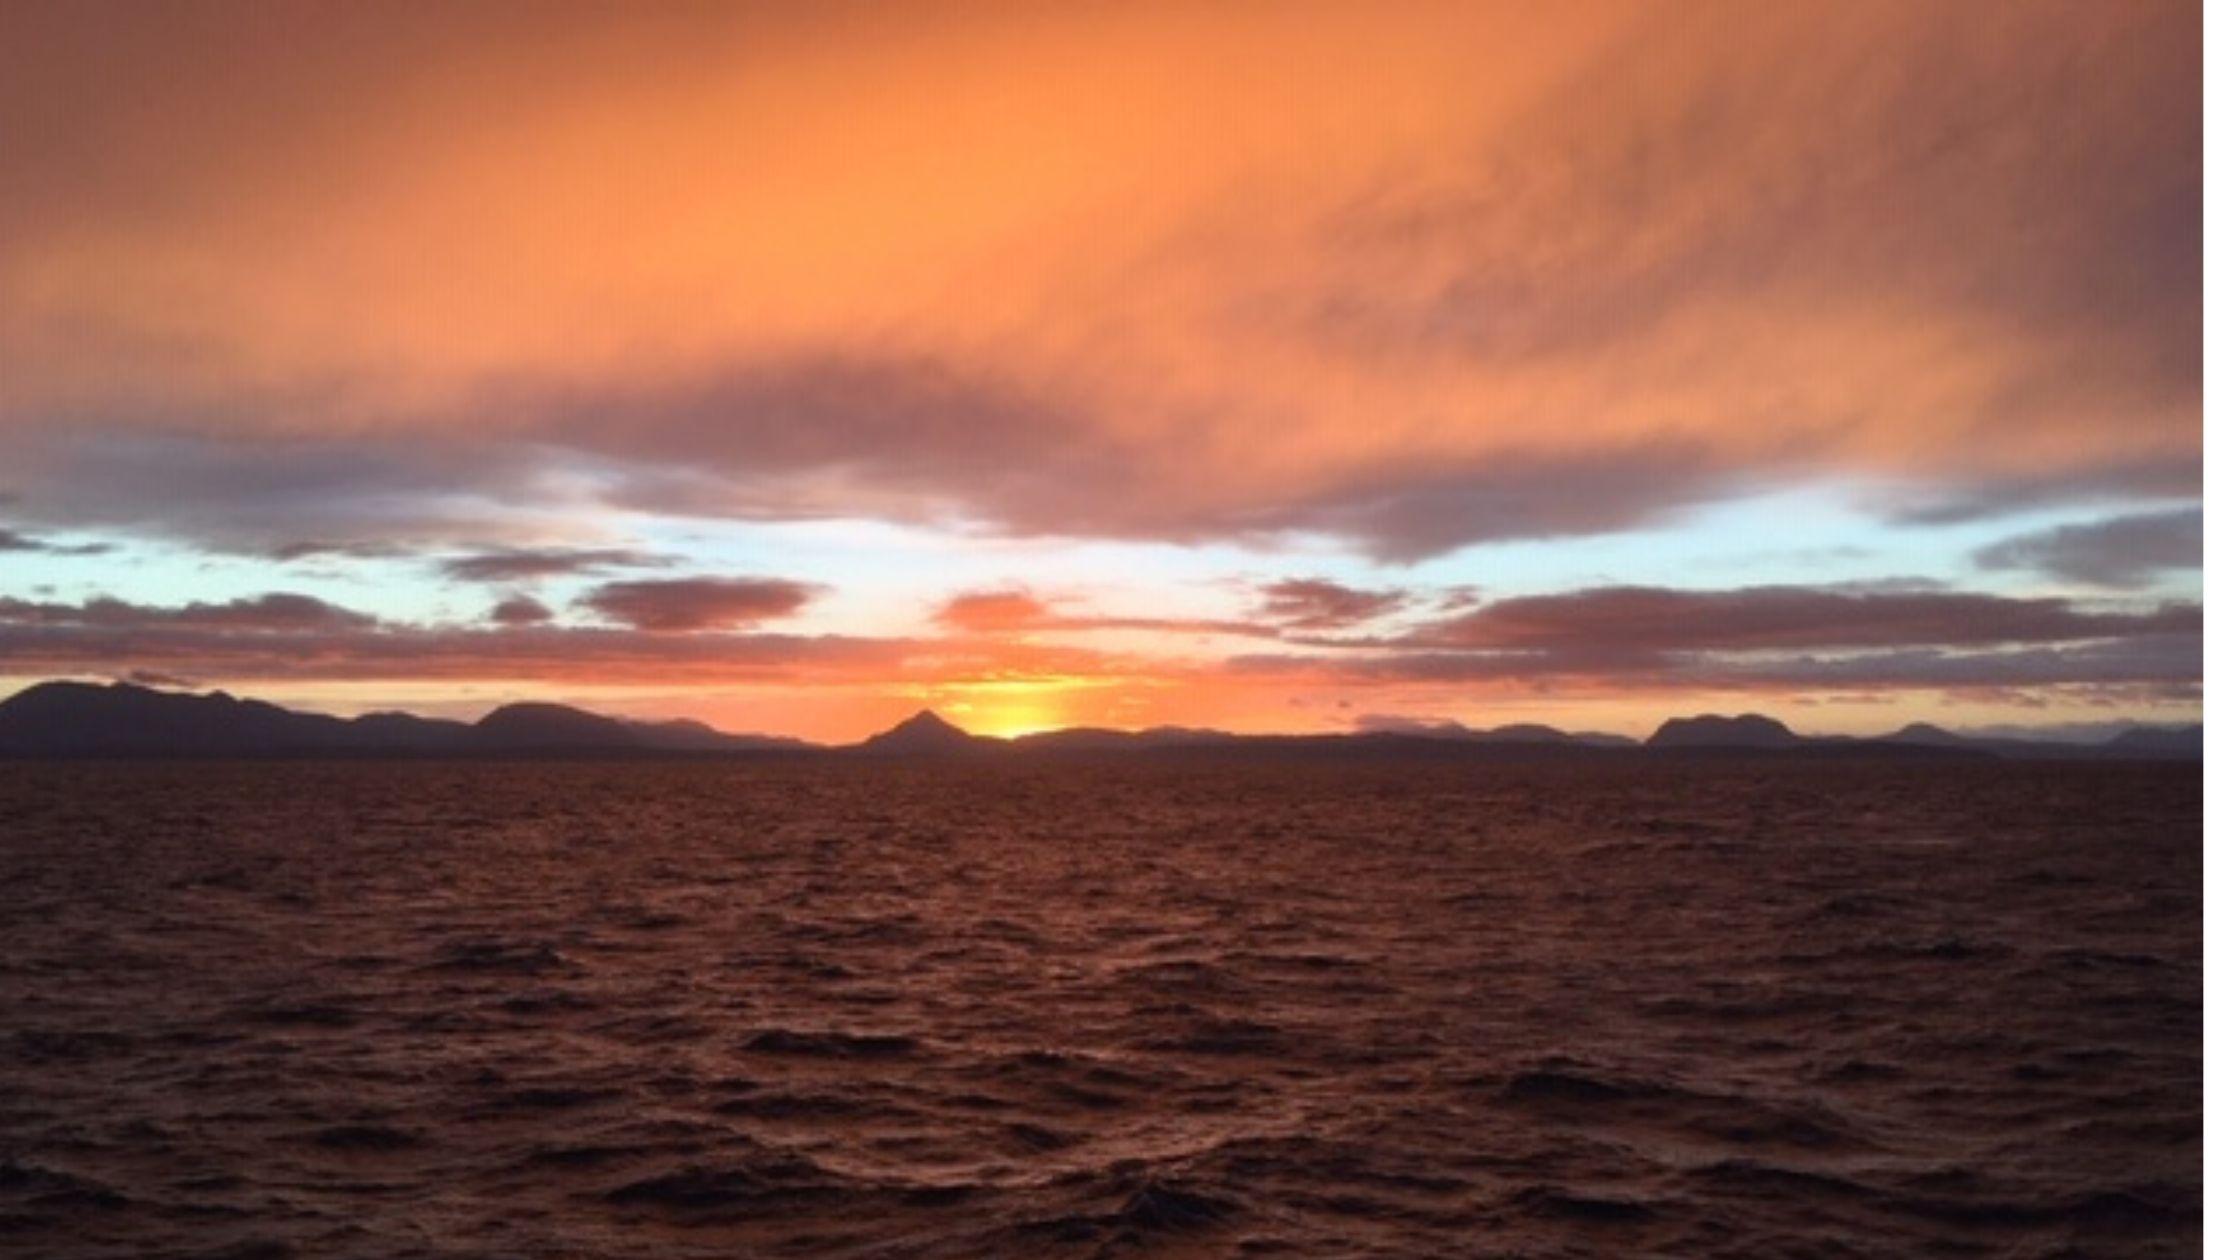 Sun setting at sea